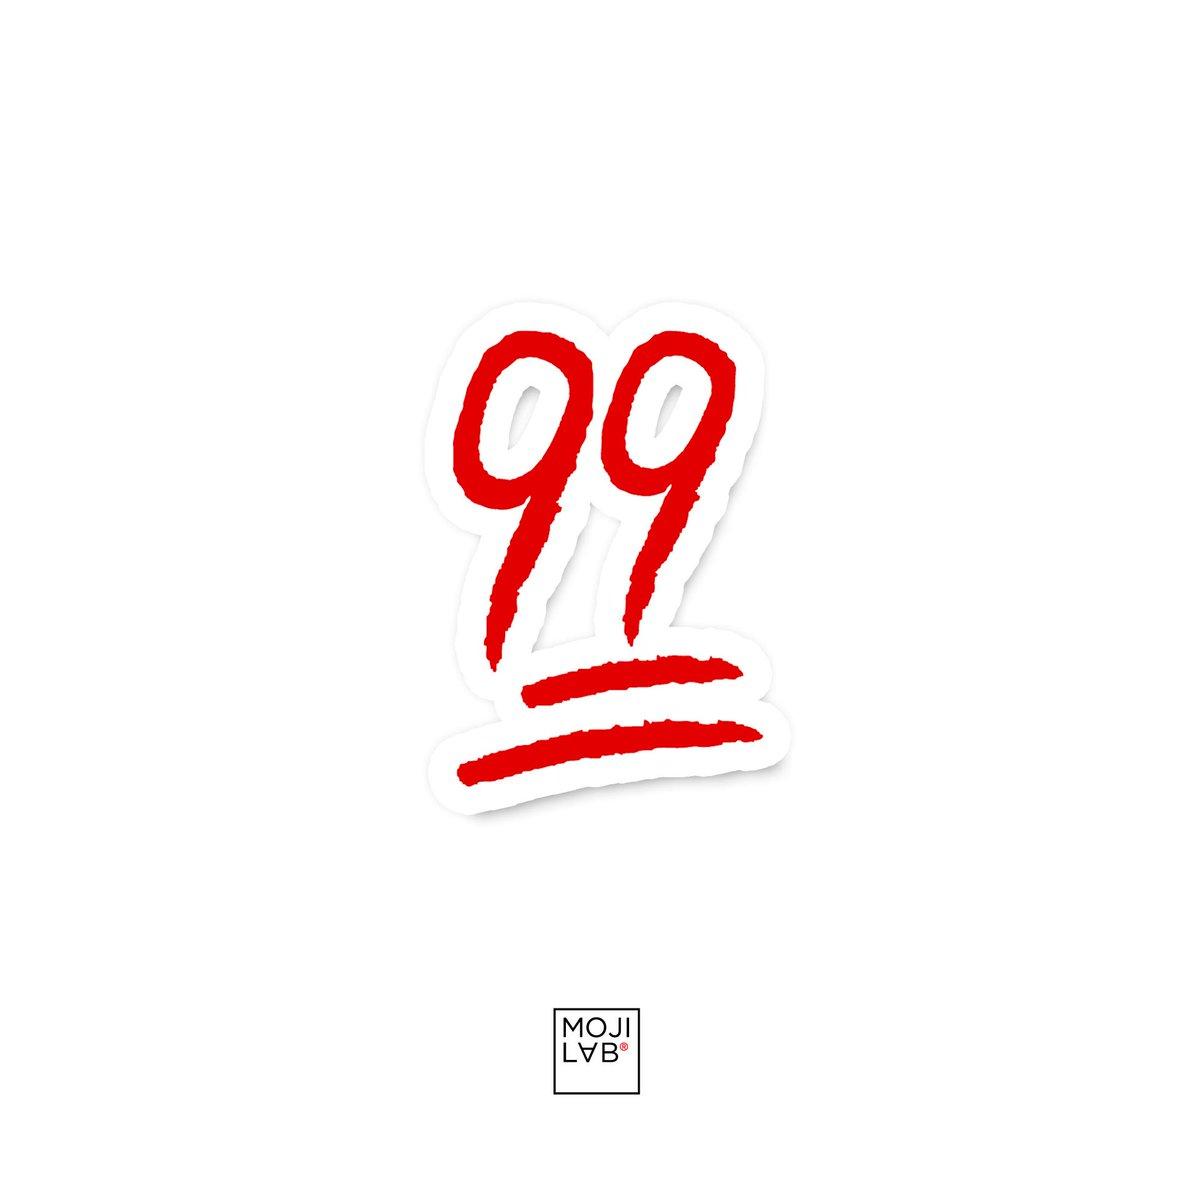 Mojilab On Twitter Mojilab Presents The 99 Emoji When 100 Is